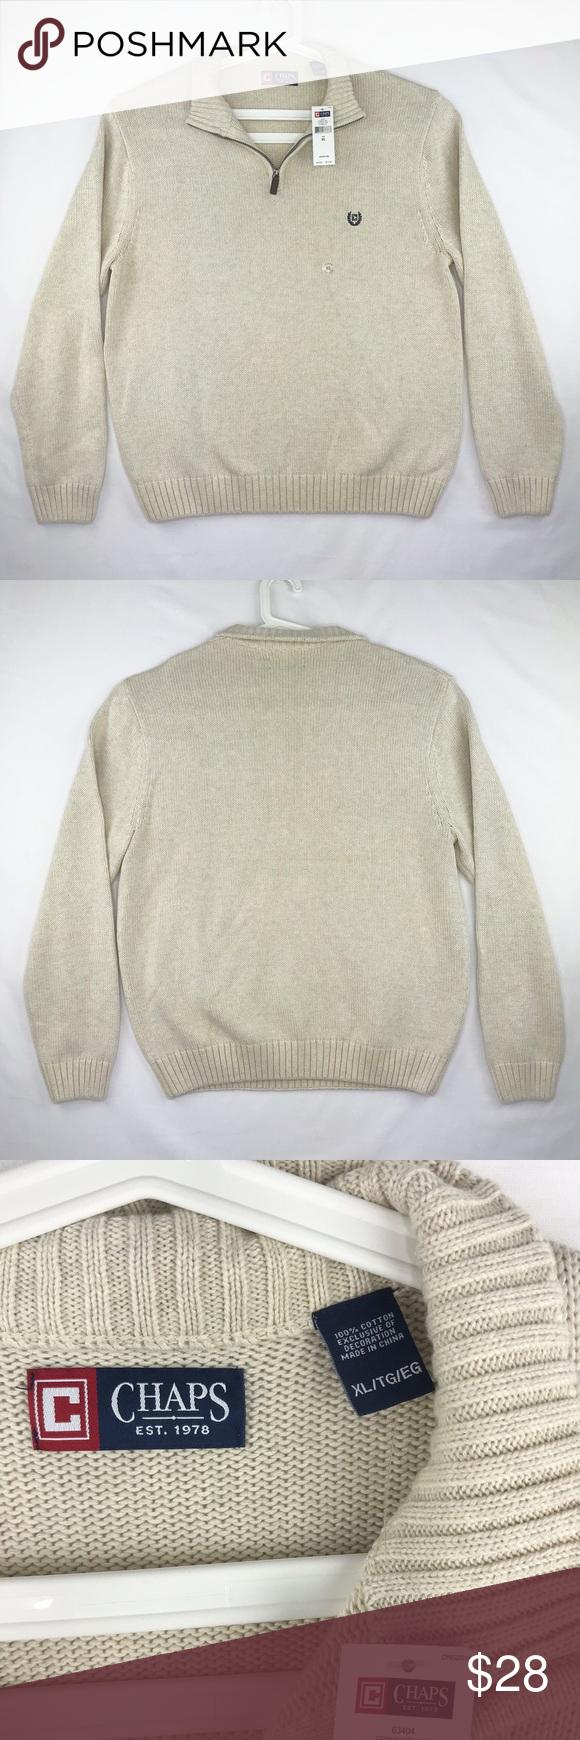 Chaps Mens North Coast Pullover Sweater